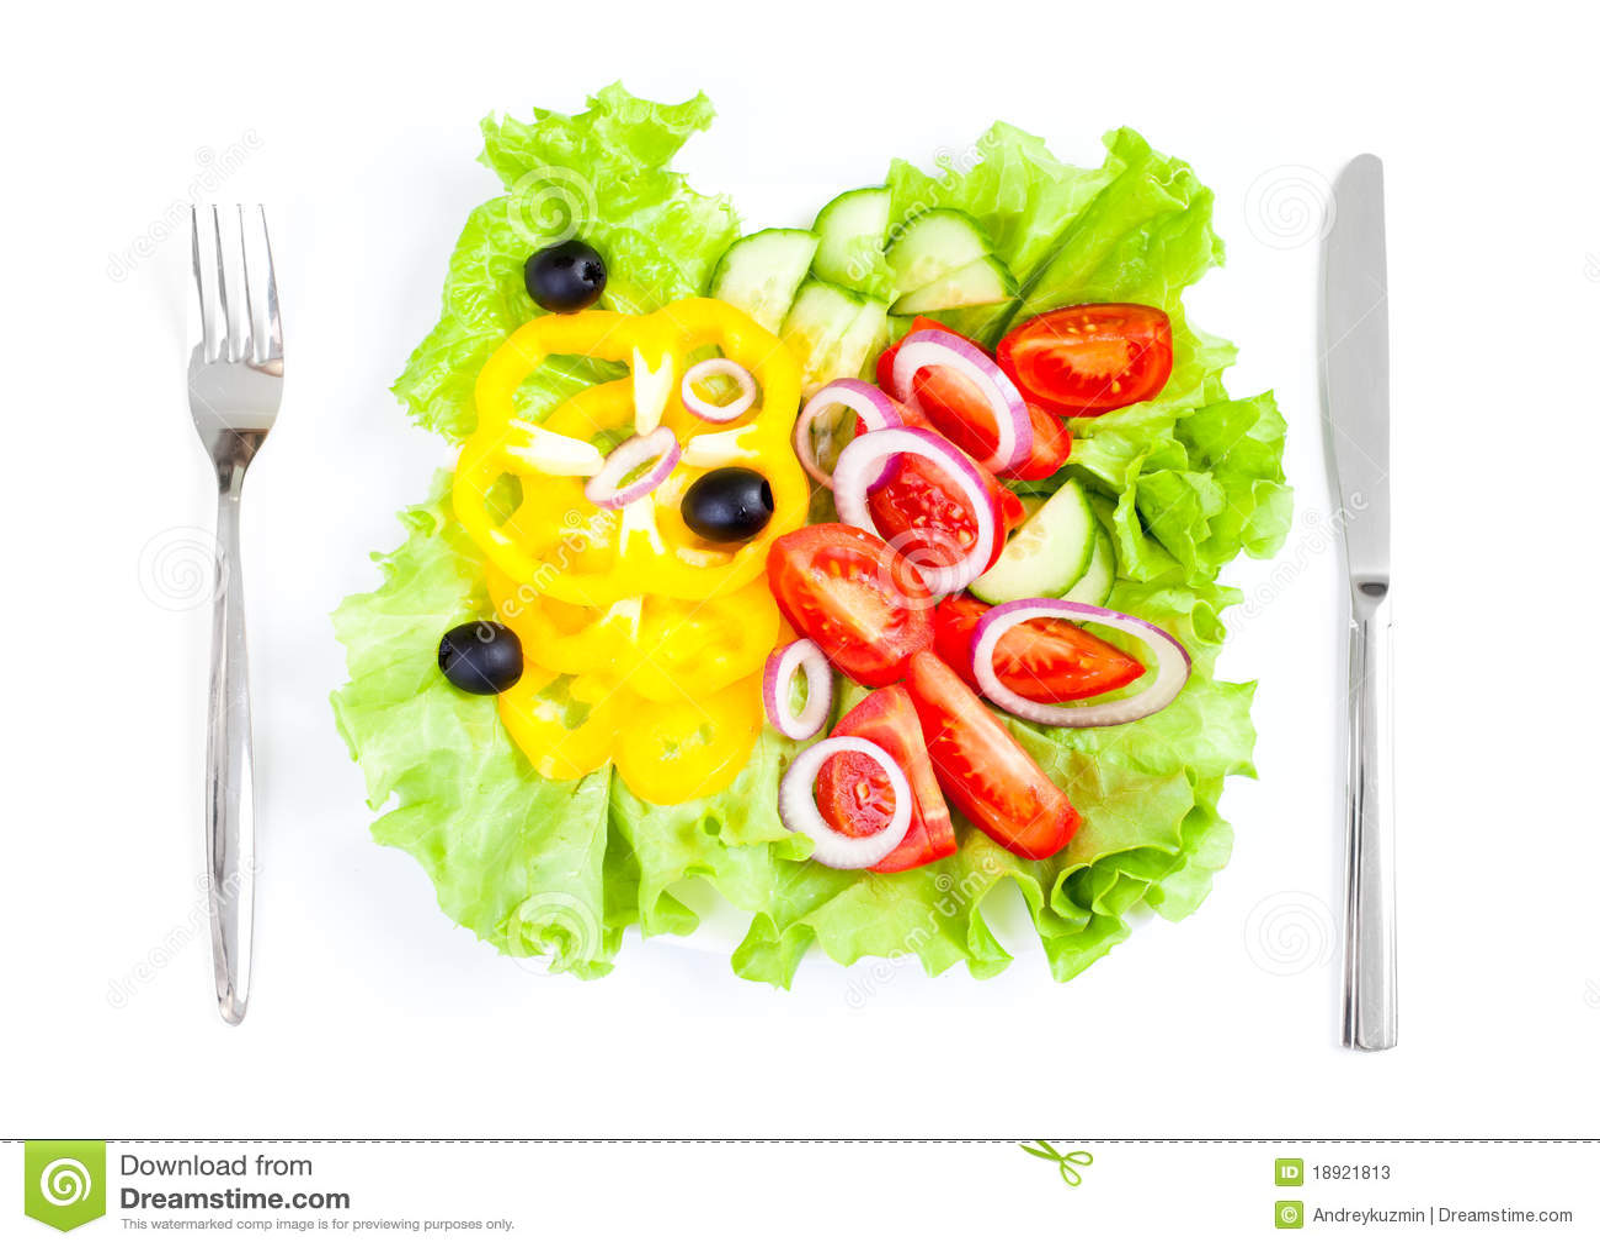 Healthy Food Fresh Vegetable Salad Top View Stock Photos - Image: 18921813